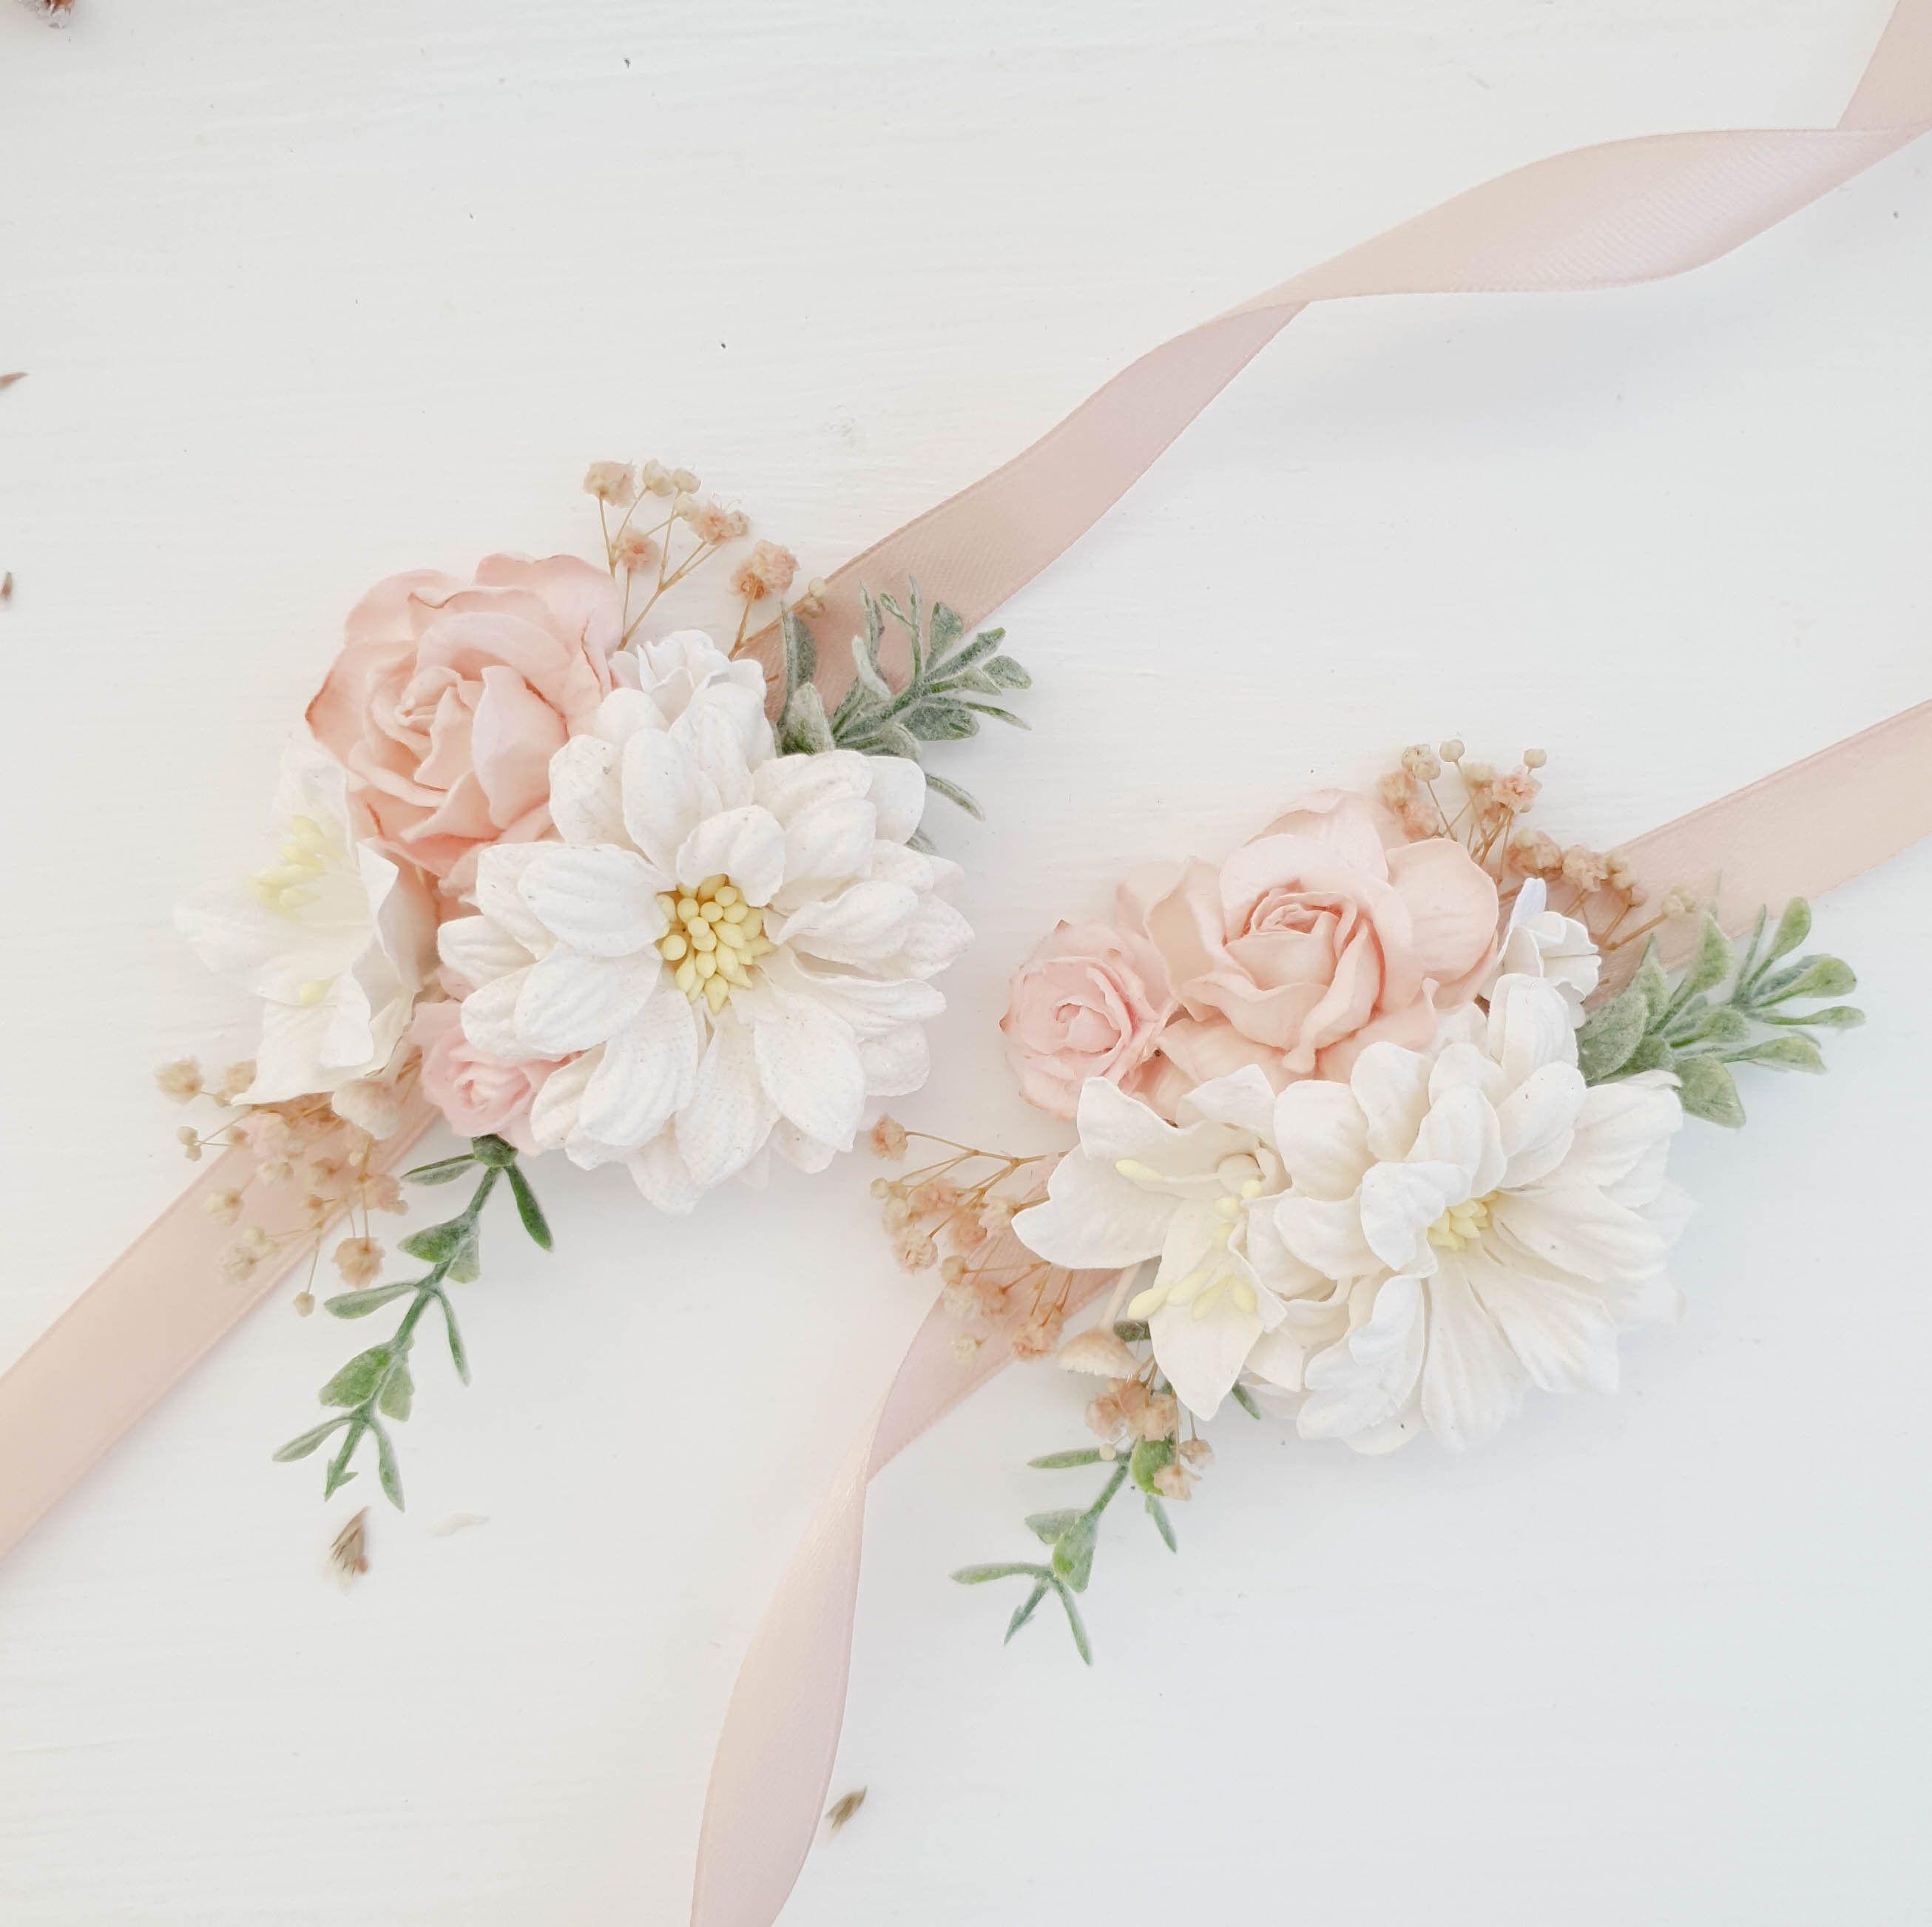 Blush Flower wrist corsage, Bridesmaids wrist corsage, Flower wrist corsage wedding #corsages